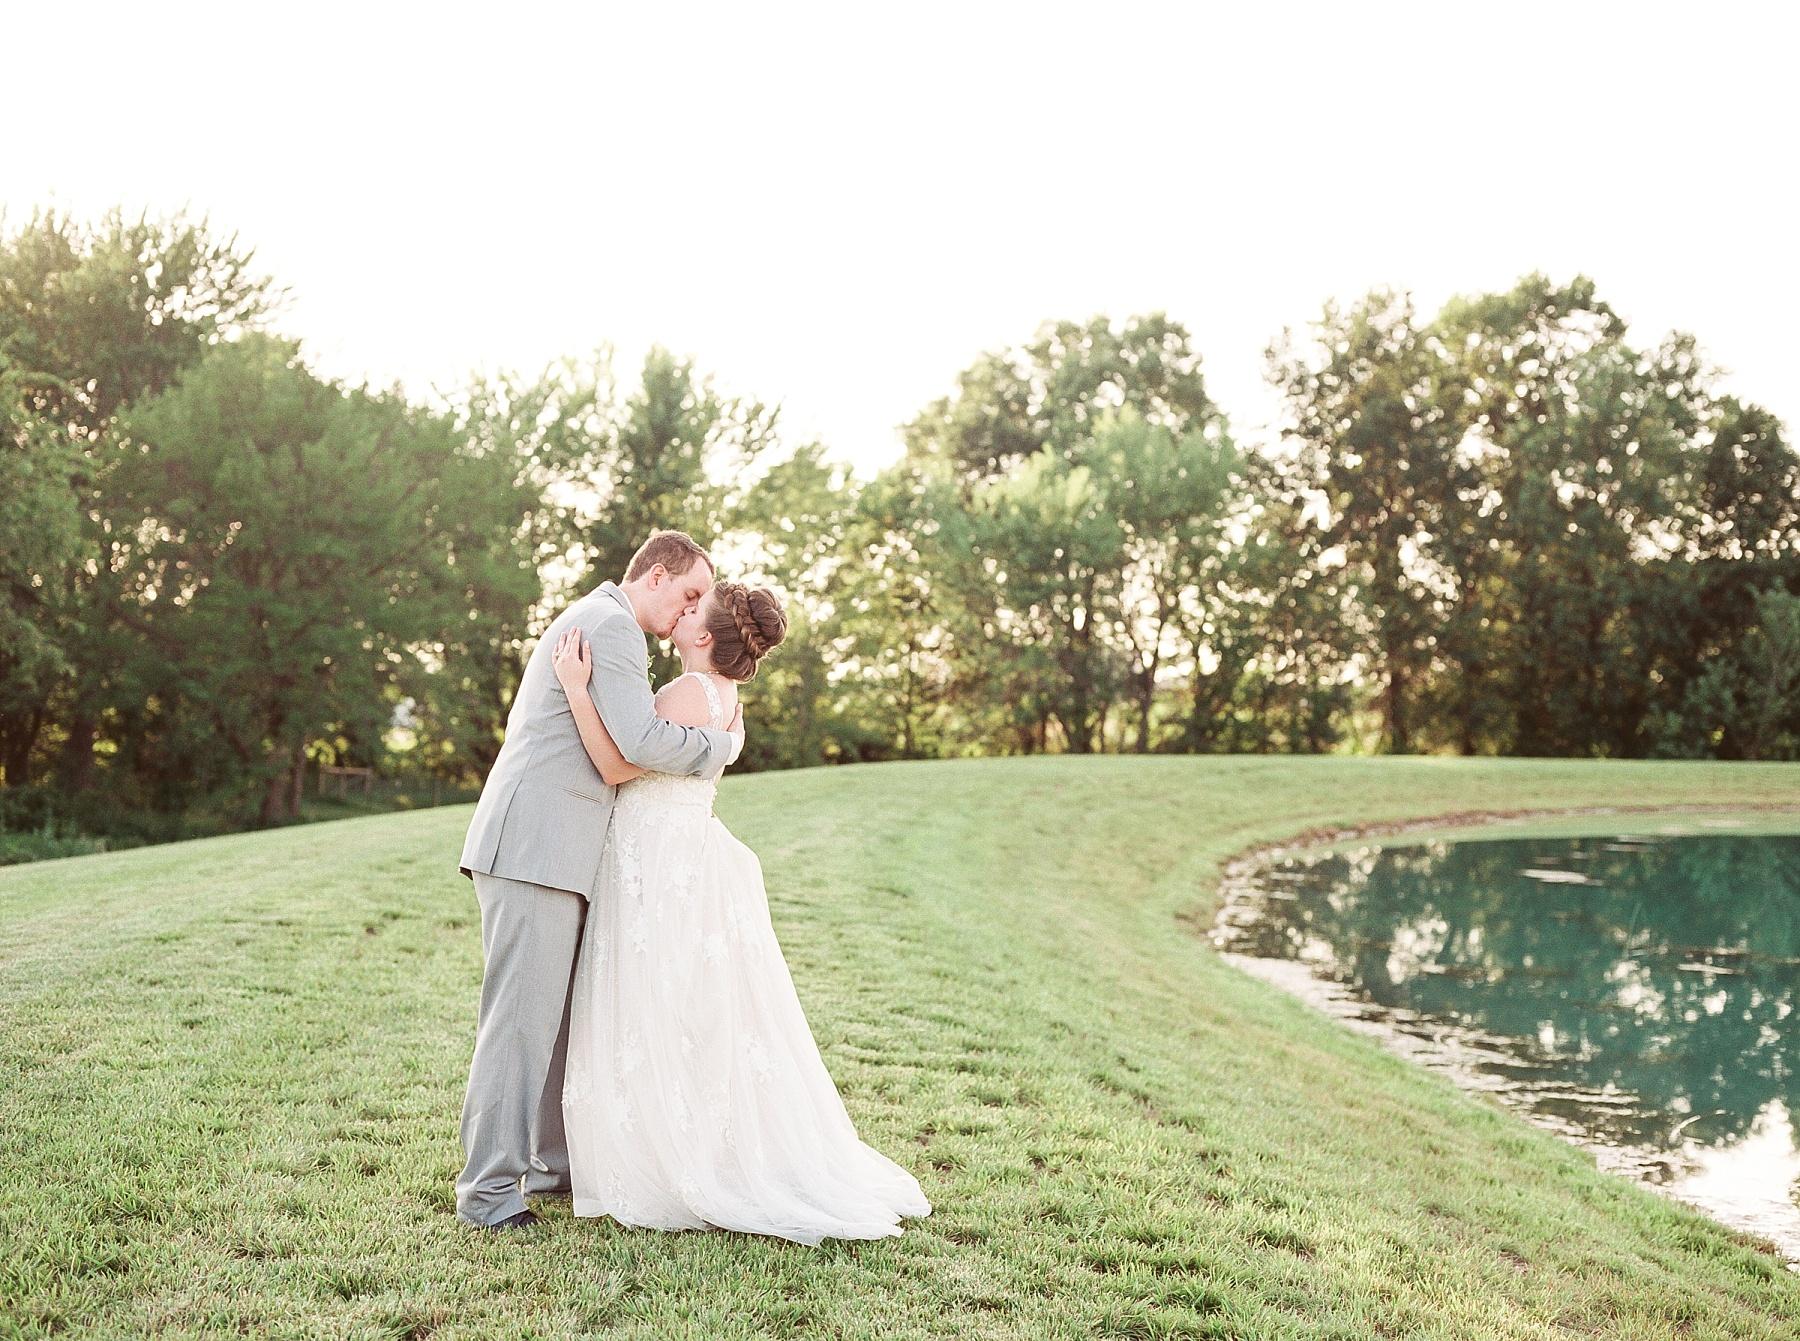 Intimate Summer Wedding at Emerson Fields by Kelsi Kliethermes Photography Best Missouri and Maui Wedding Photographer_0012.jpg